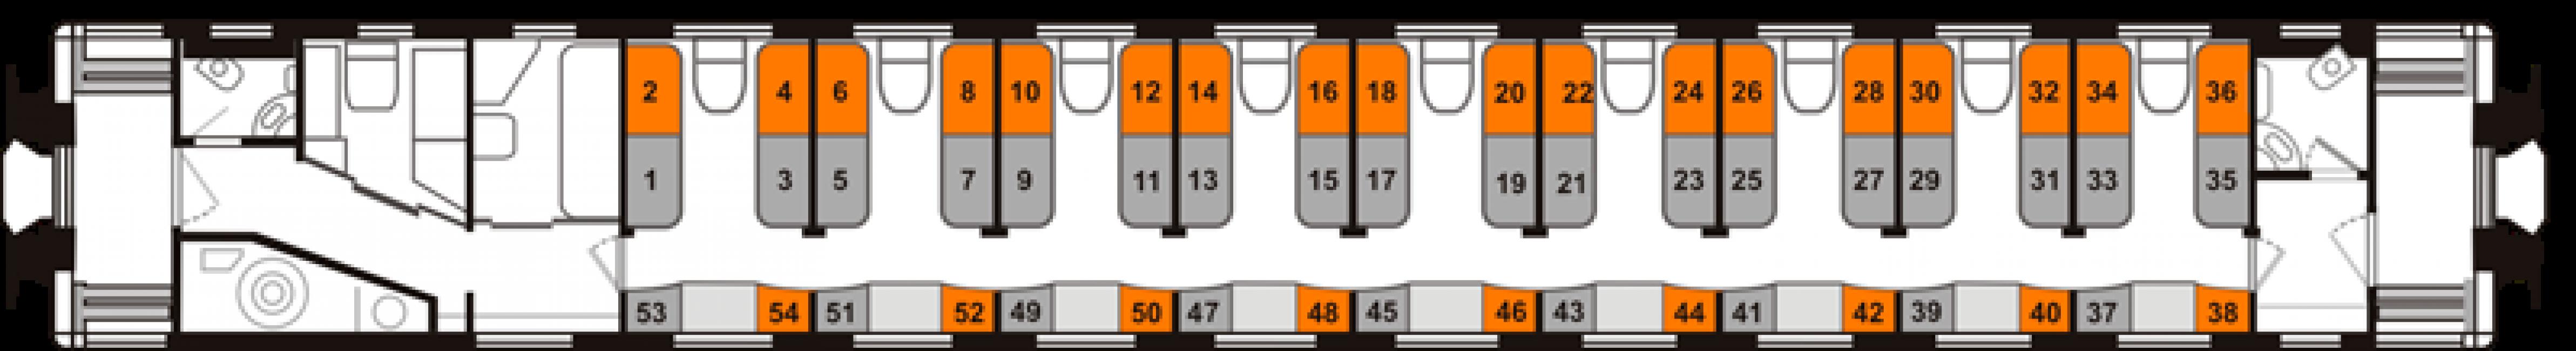 Схема поезда плацкарт фото